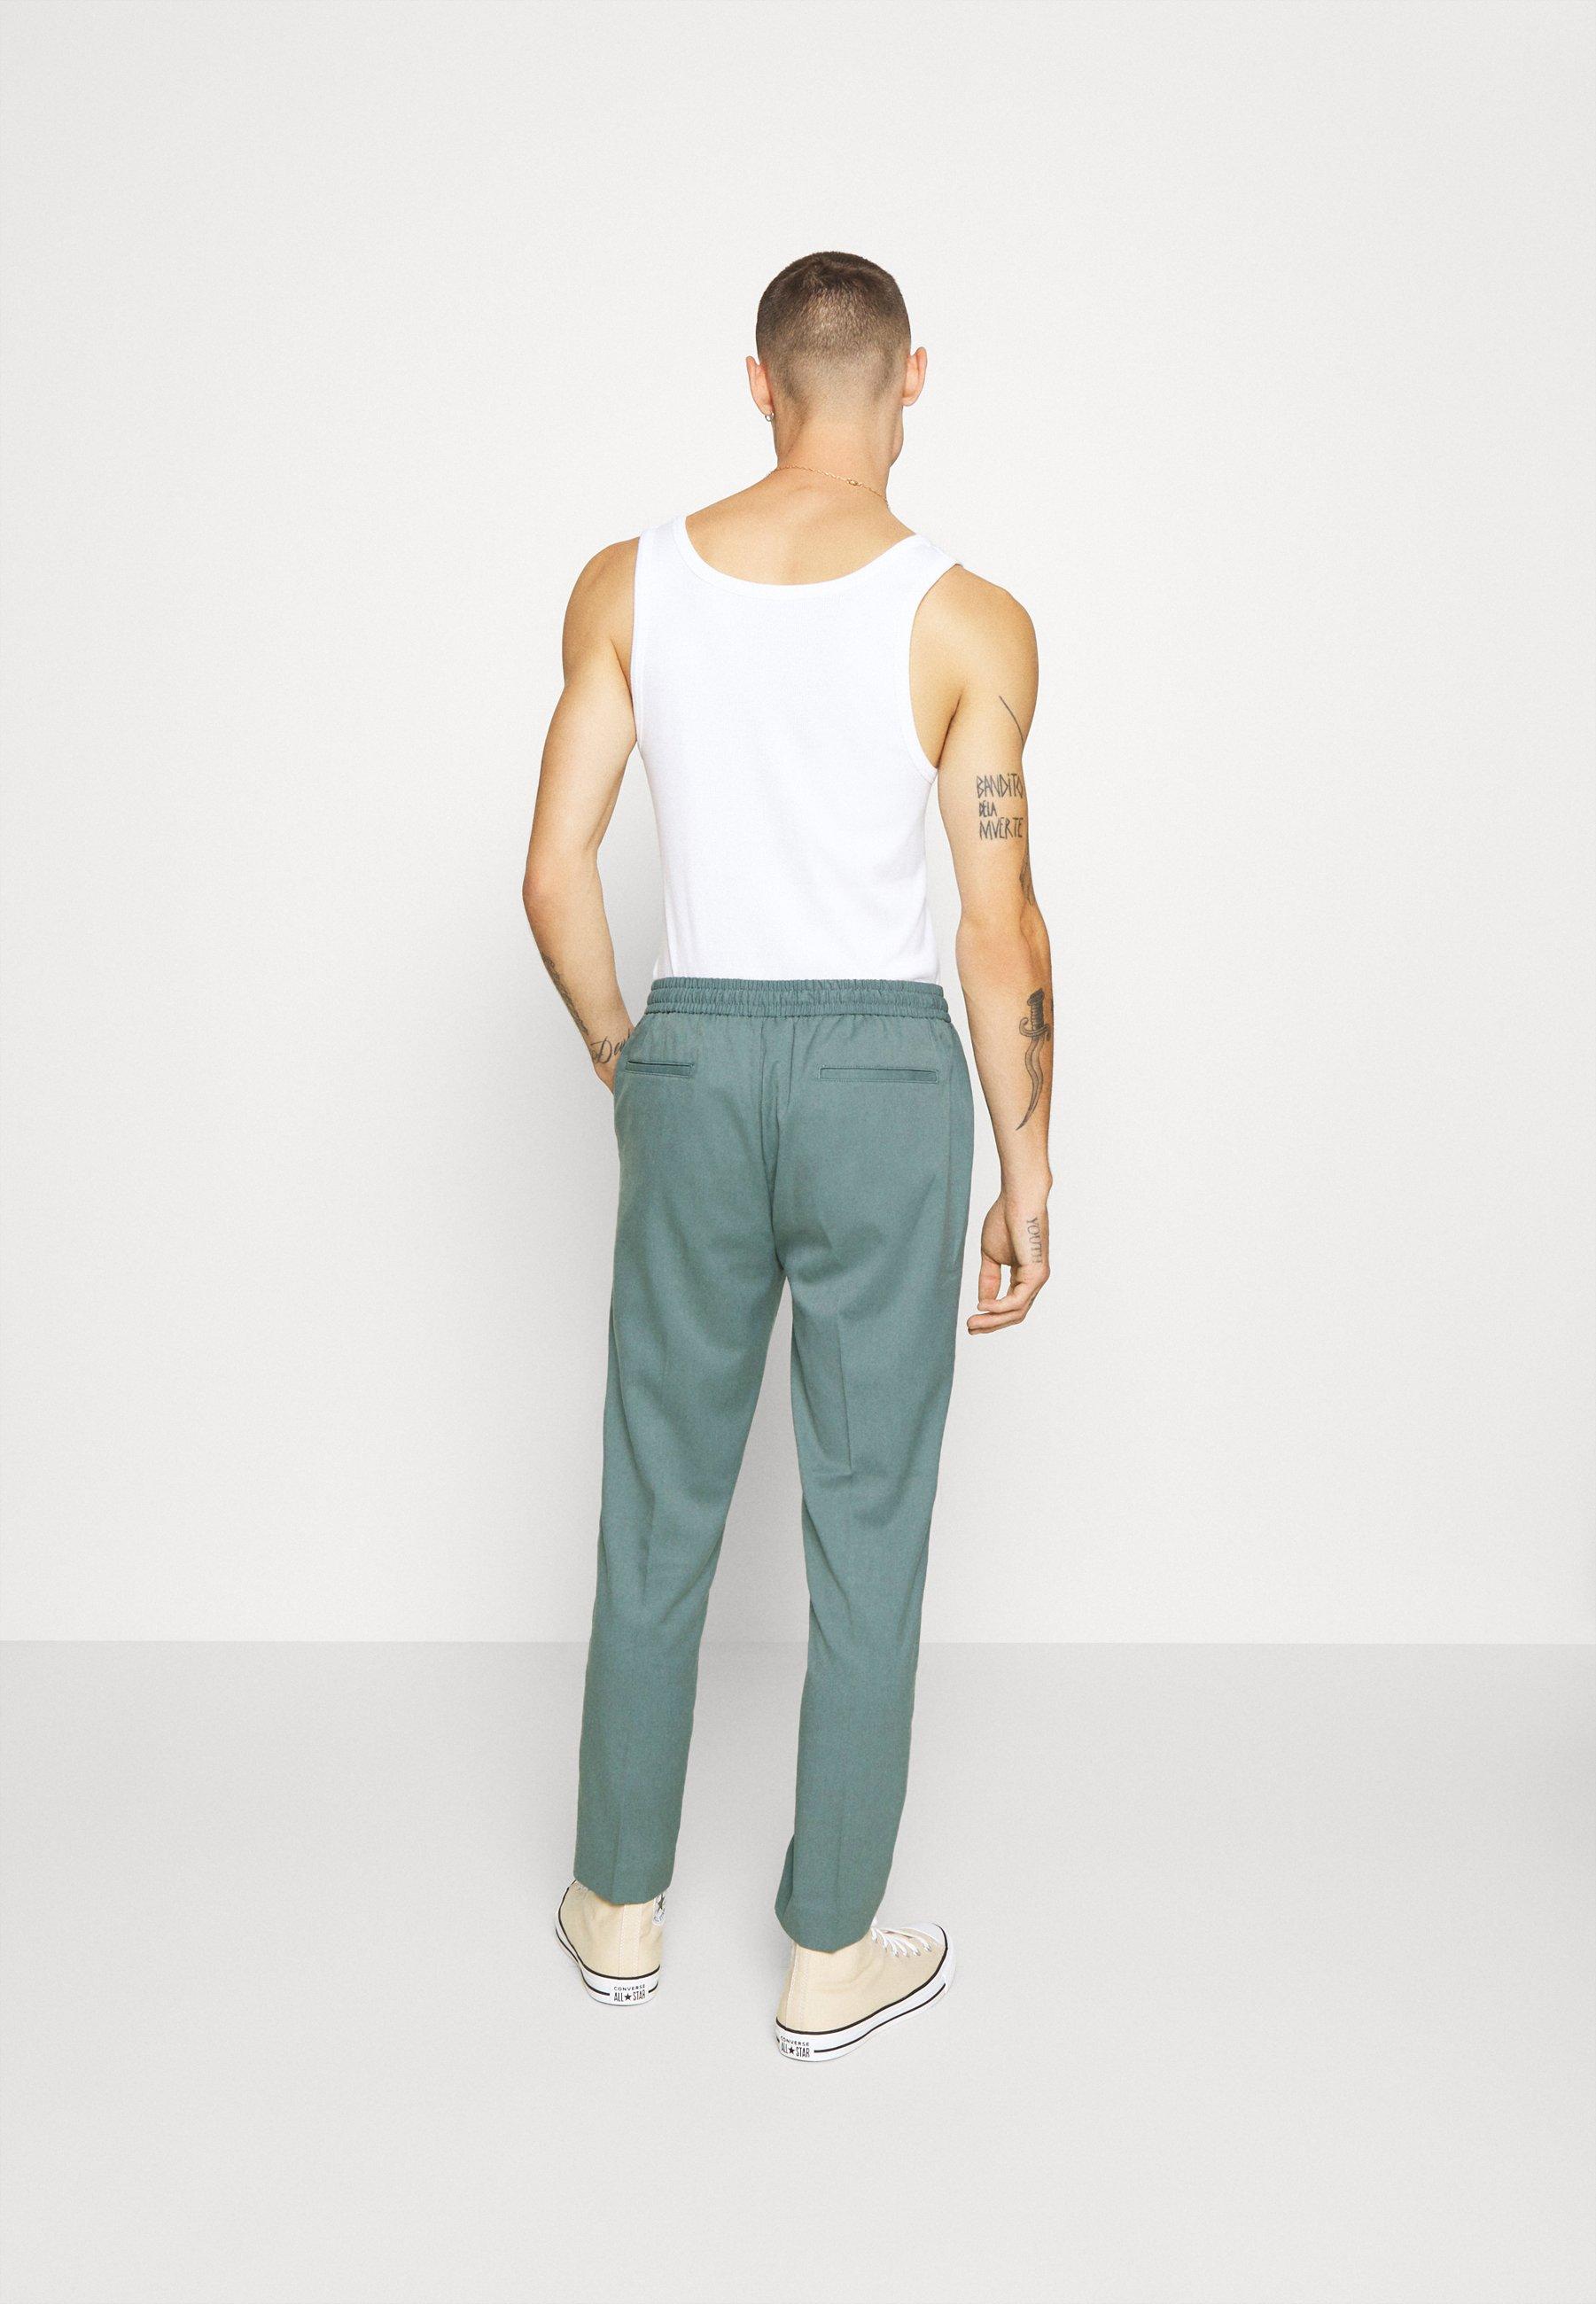 Topman Bukse - Green/grønn